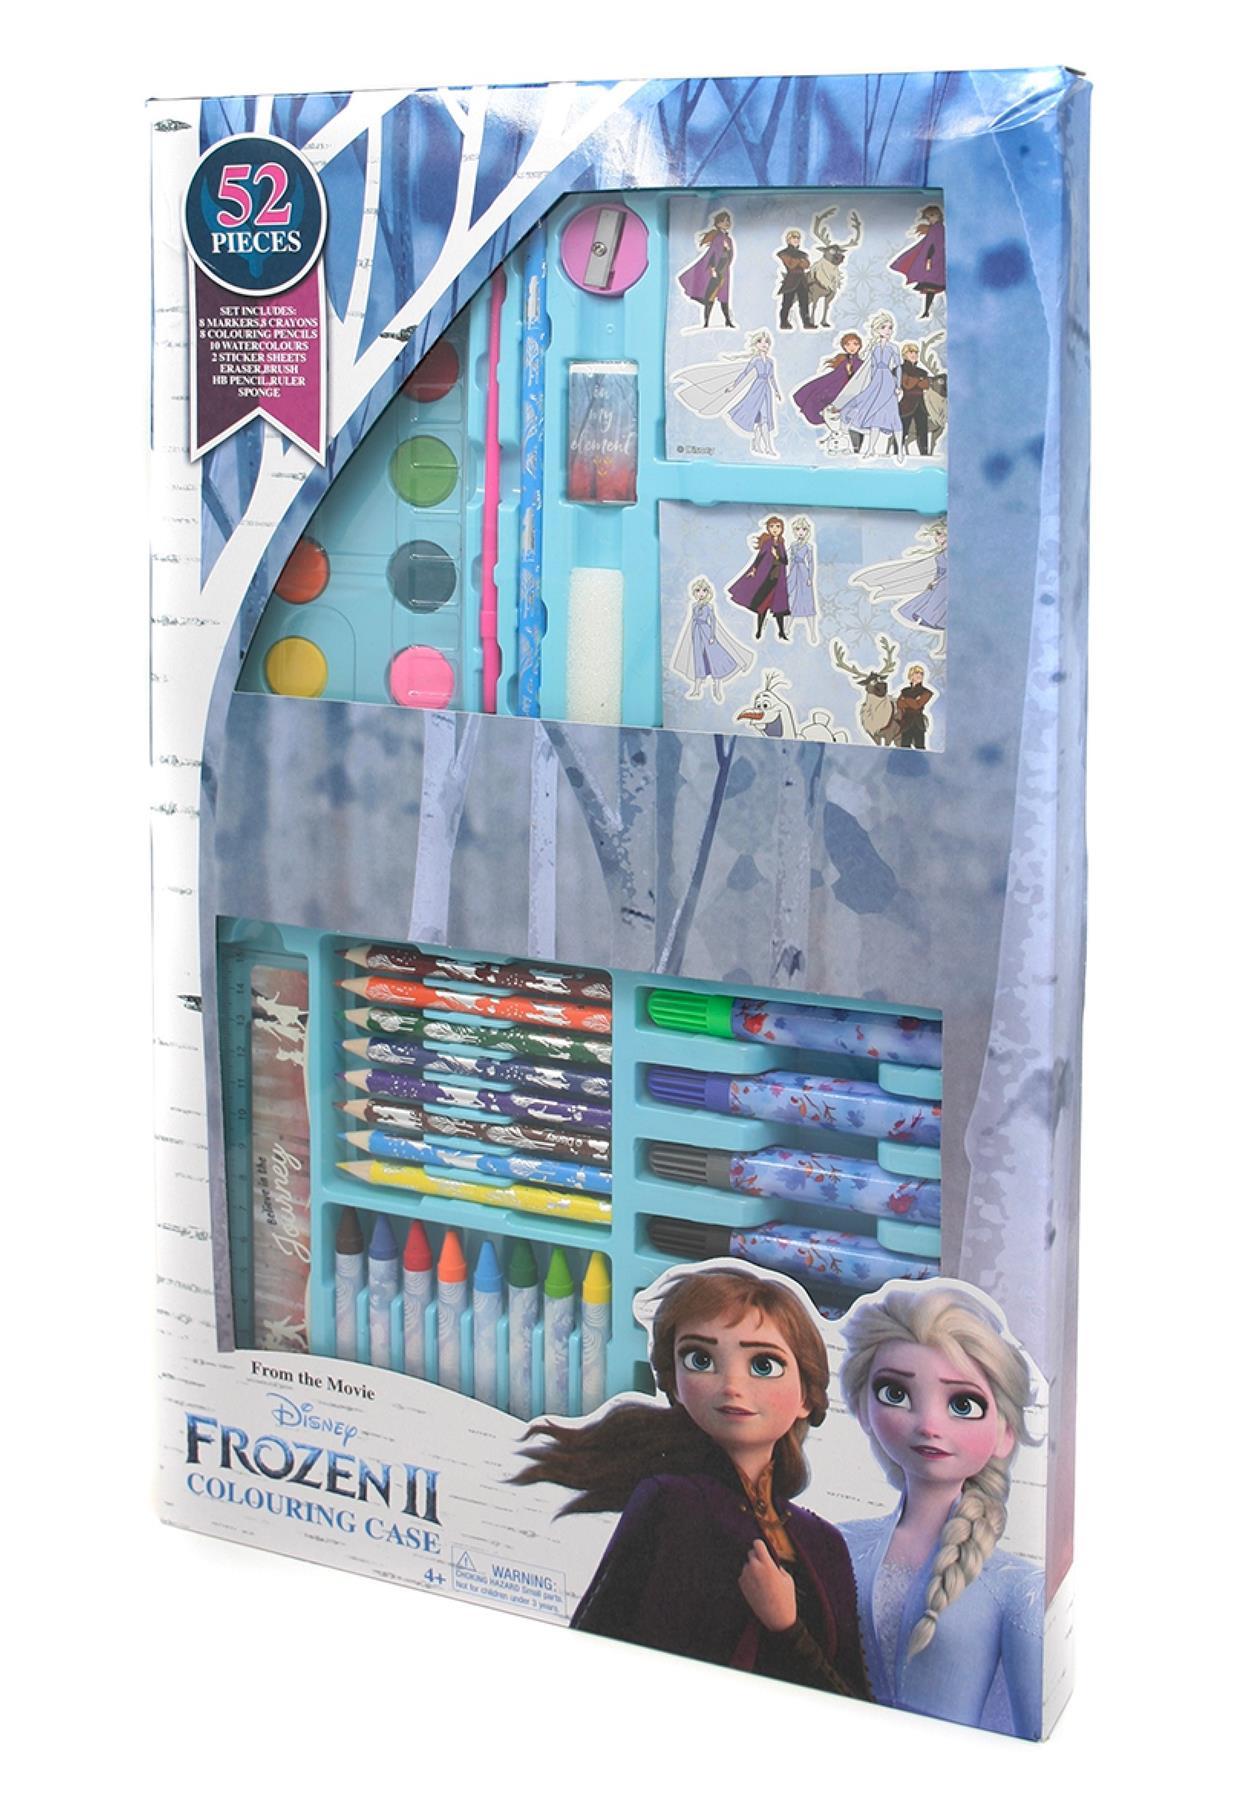 thumbnail 6 - Disney Frozen 2 Elsa Stationary Gift Set Case Chest Pencil Case Stocking Filler